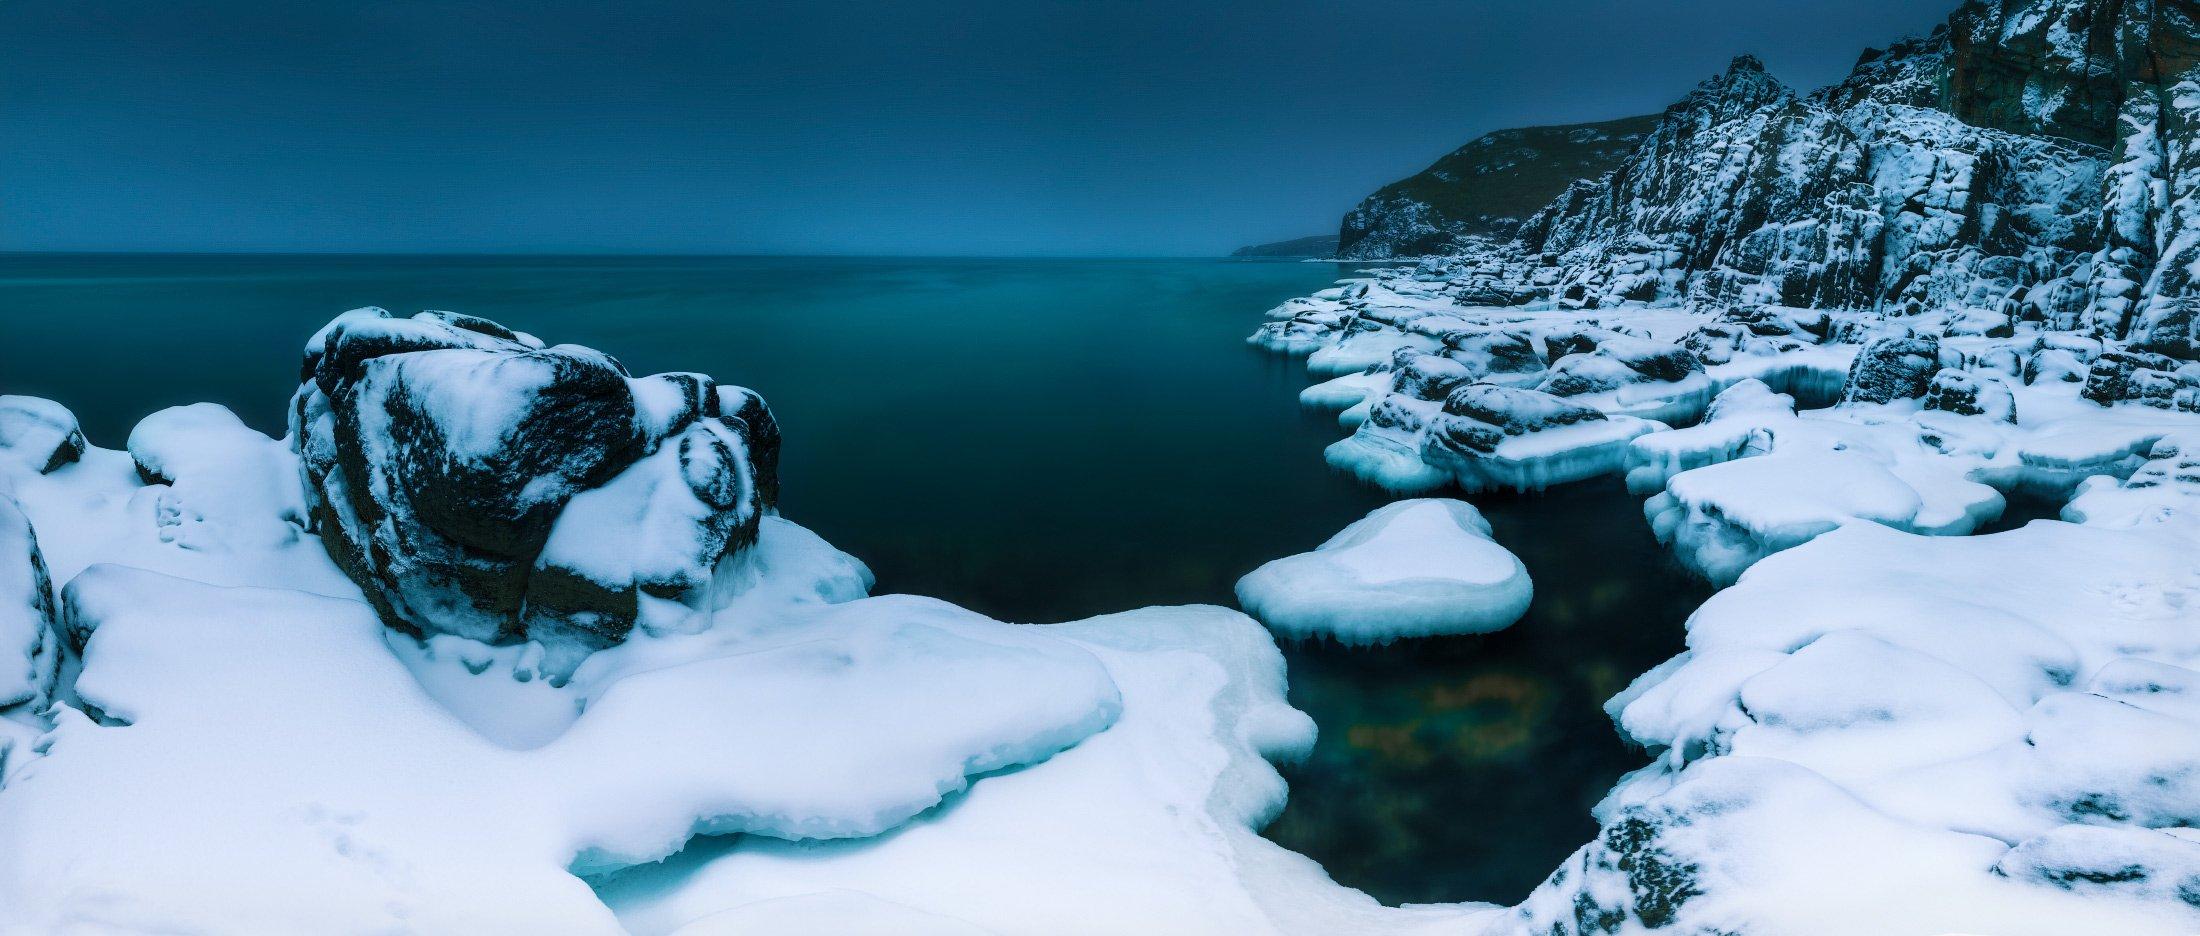 панорама, зима, море, лёд, снег, Андрей Кровлин